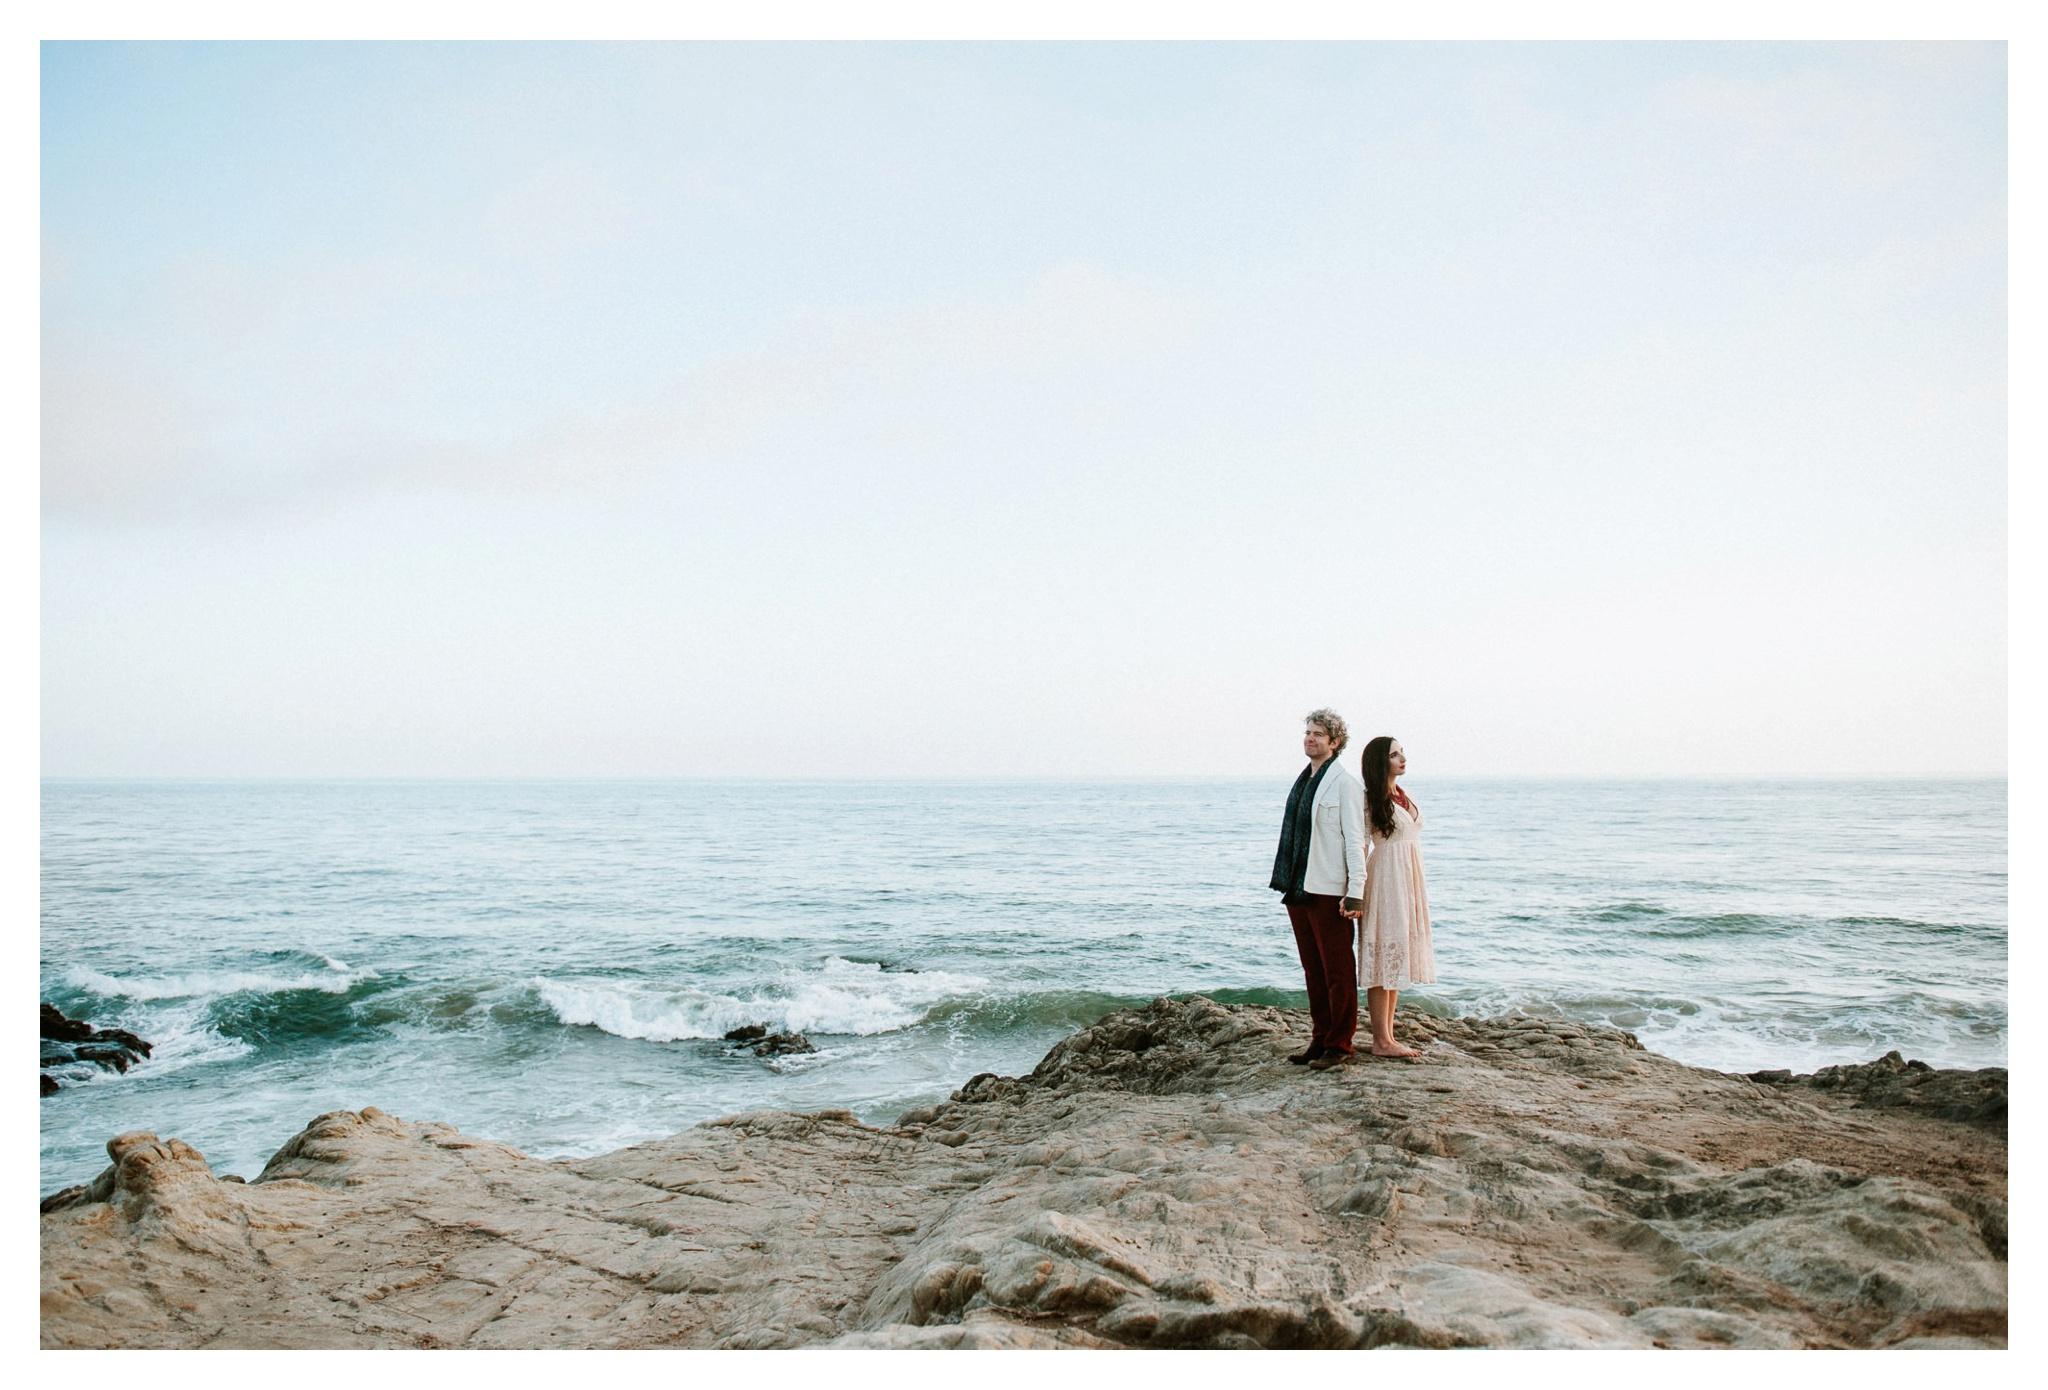 Leo_Carrillo_Malibu_Engagement_0054.jpg